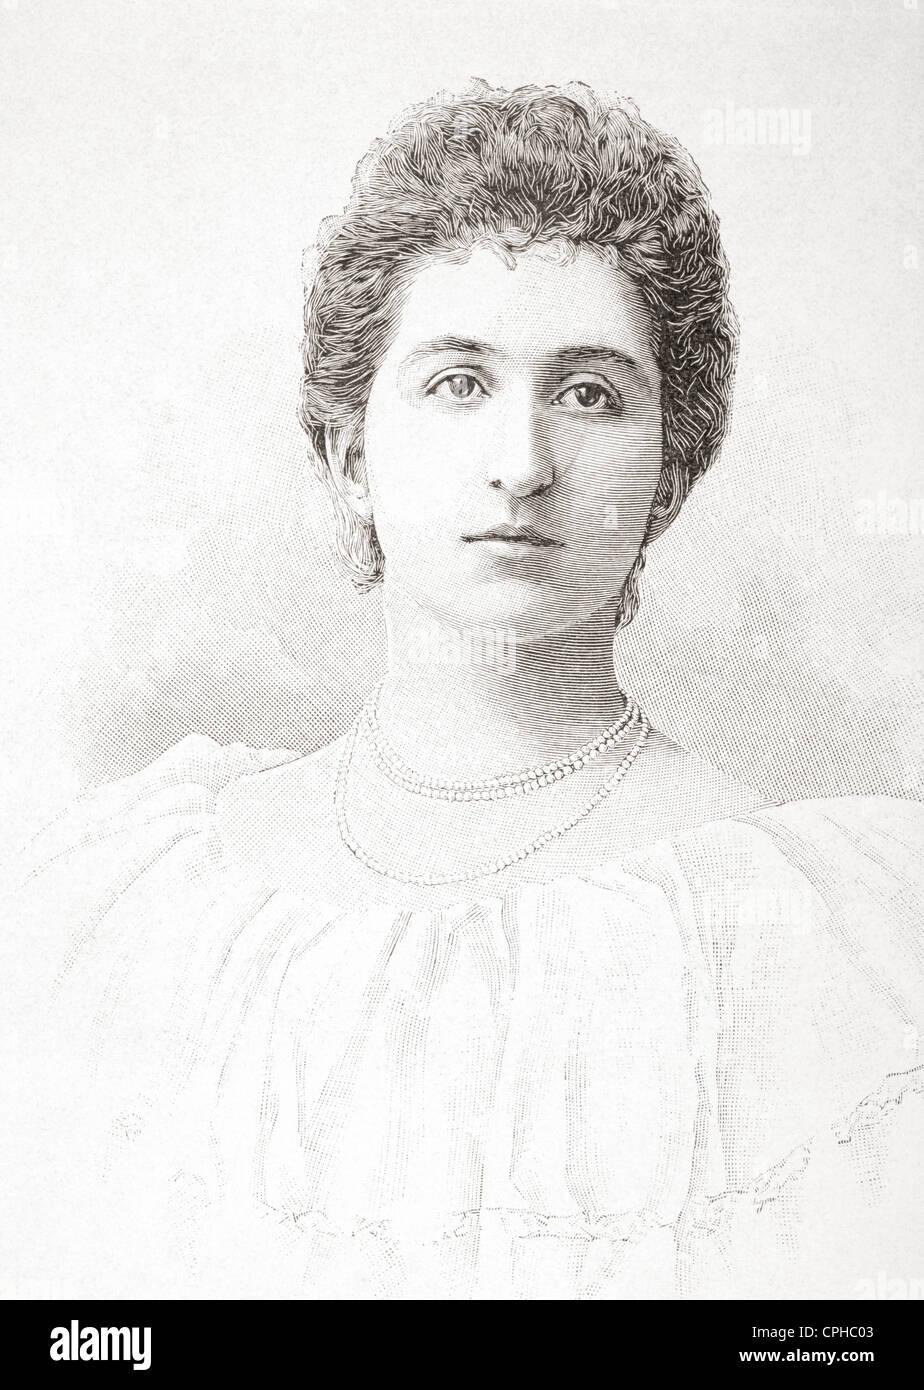 Anna Petrović-Njegoš, Princess of Montenegro, 1874 - 1971. Wife of Prince Francis Joseph of Battenberg. - Stock Image